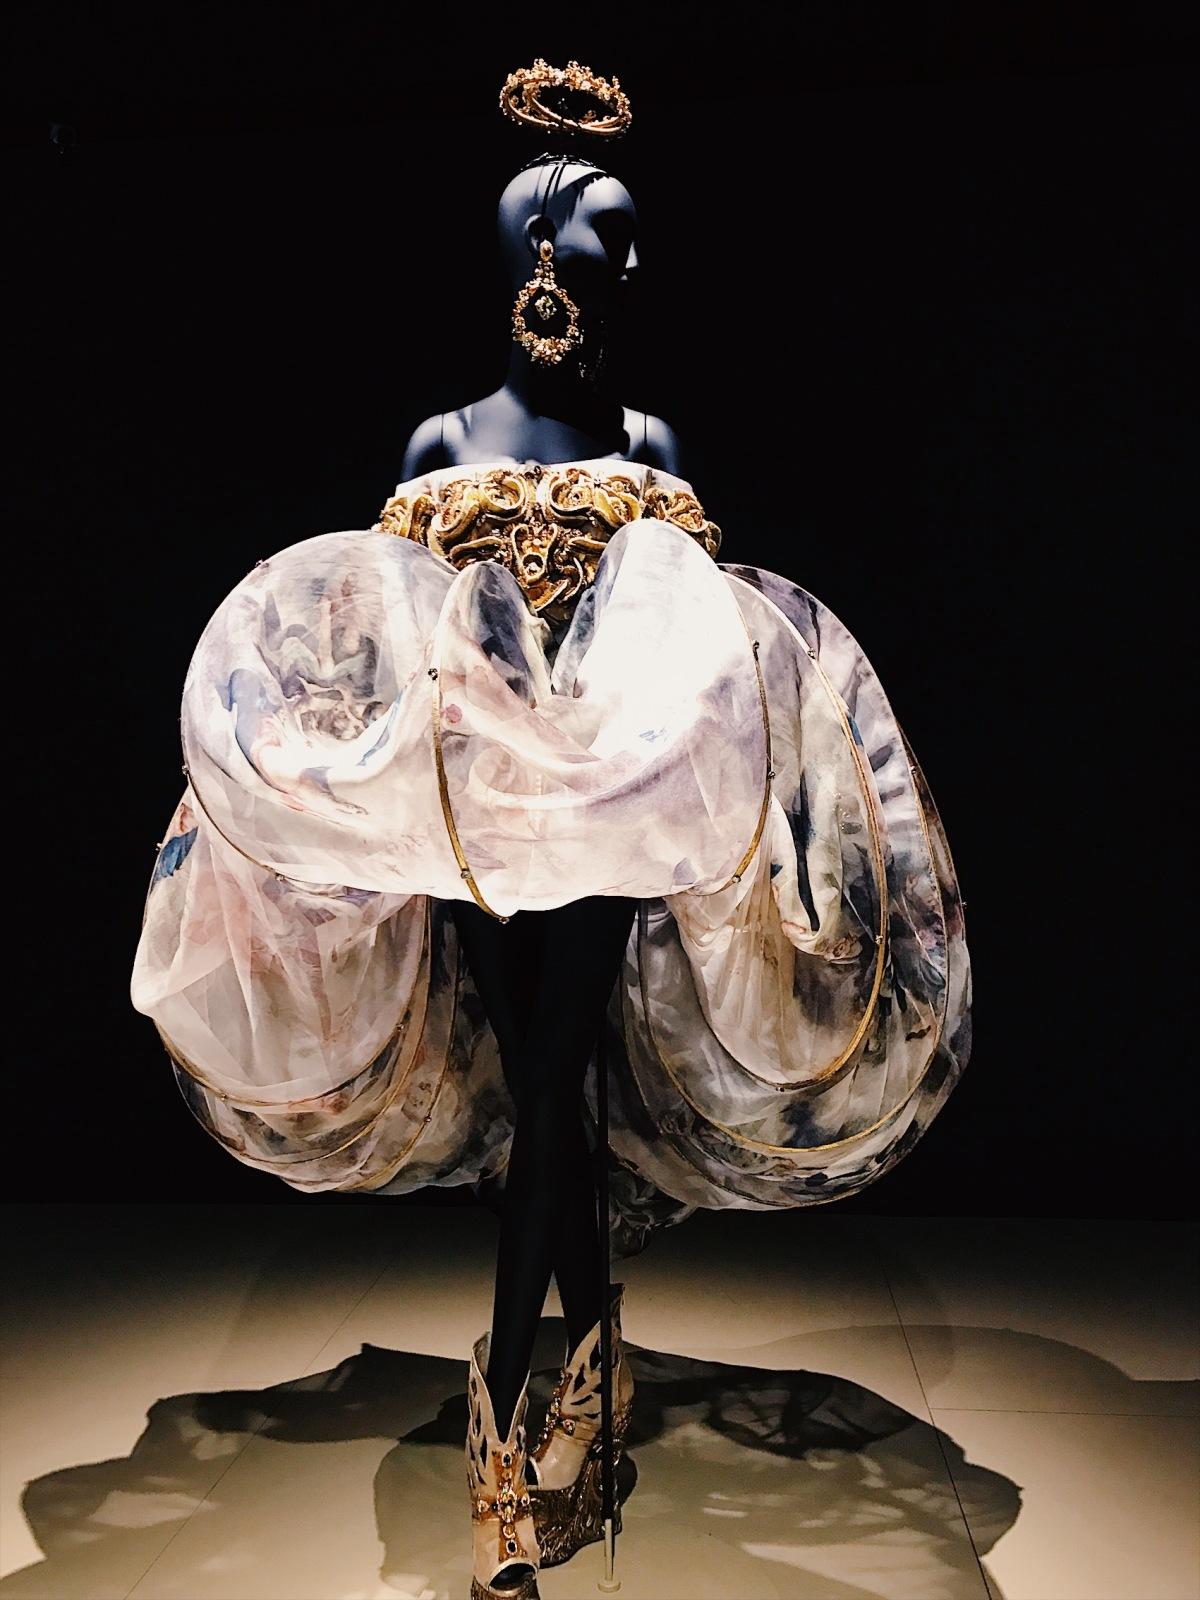 Guo Pei, Bowers Museum, Orange County, Chinese couture, haute couture, Chambre Syndicale de la Haute Couture, Paris fashion week, fashion week, fashion exhibition, museum exhibition, embroidery, Guo Pei, Guo Pei Encounter, Guo Pei 1002 Nights, fashion designer